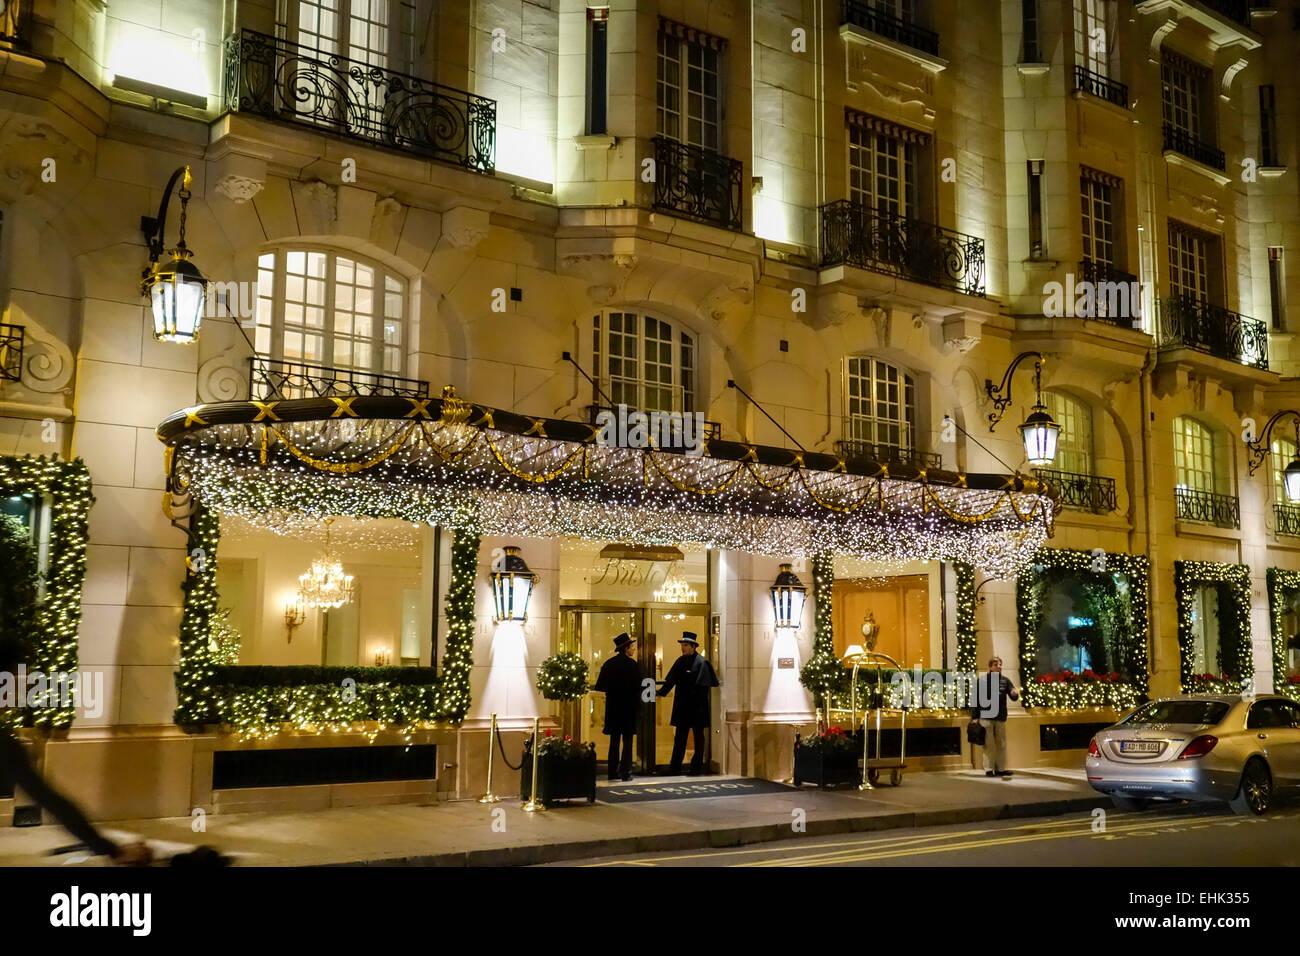 christmas decorations at hotel le bristol paris stock photo royalty free image 79710209 alamy. Black Bedroom Furniture Sets. Home Design Ideas